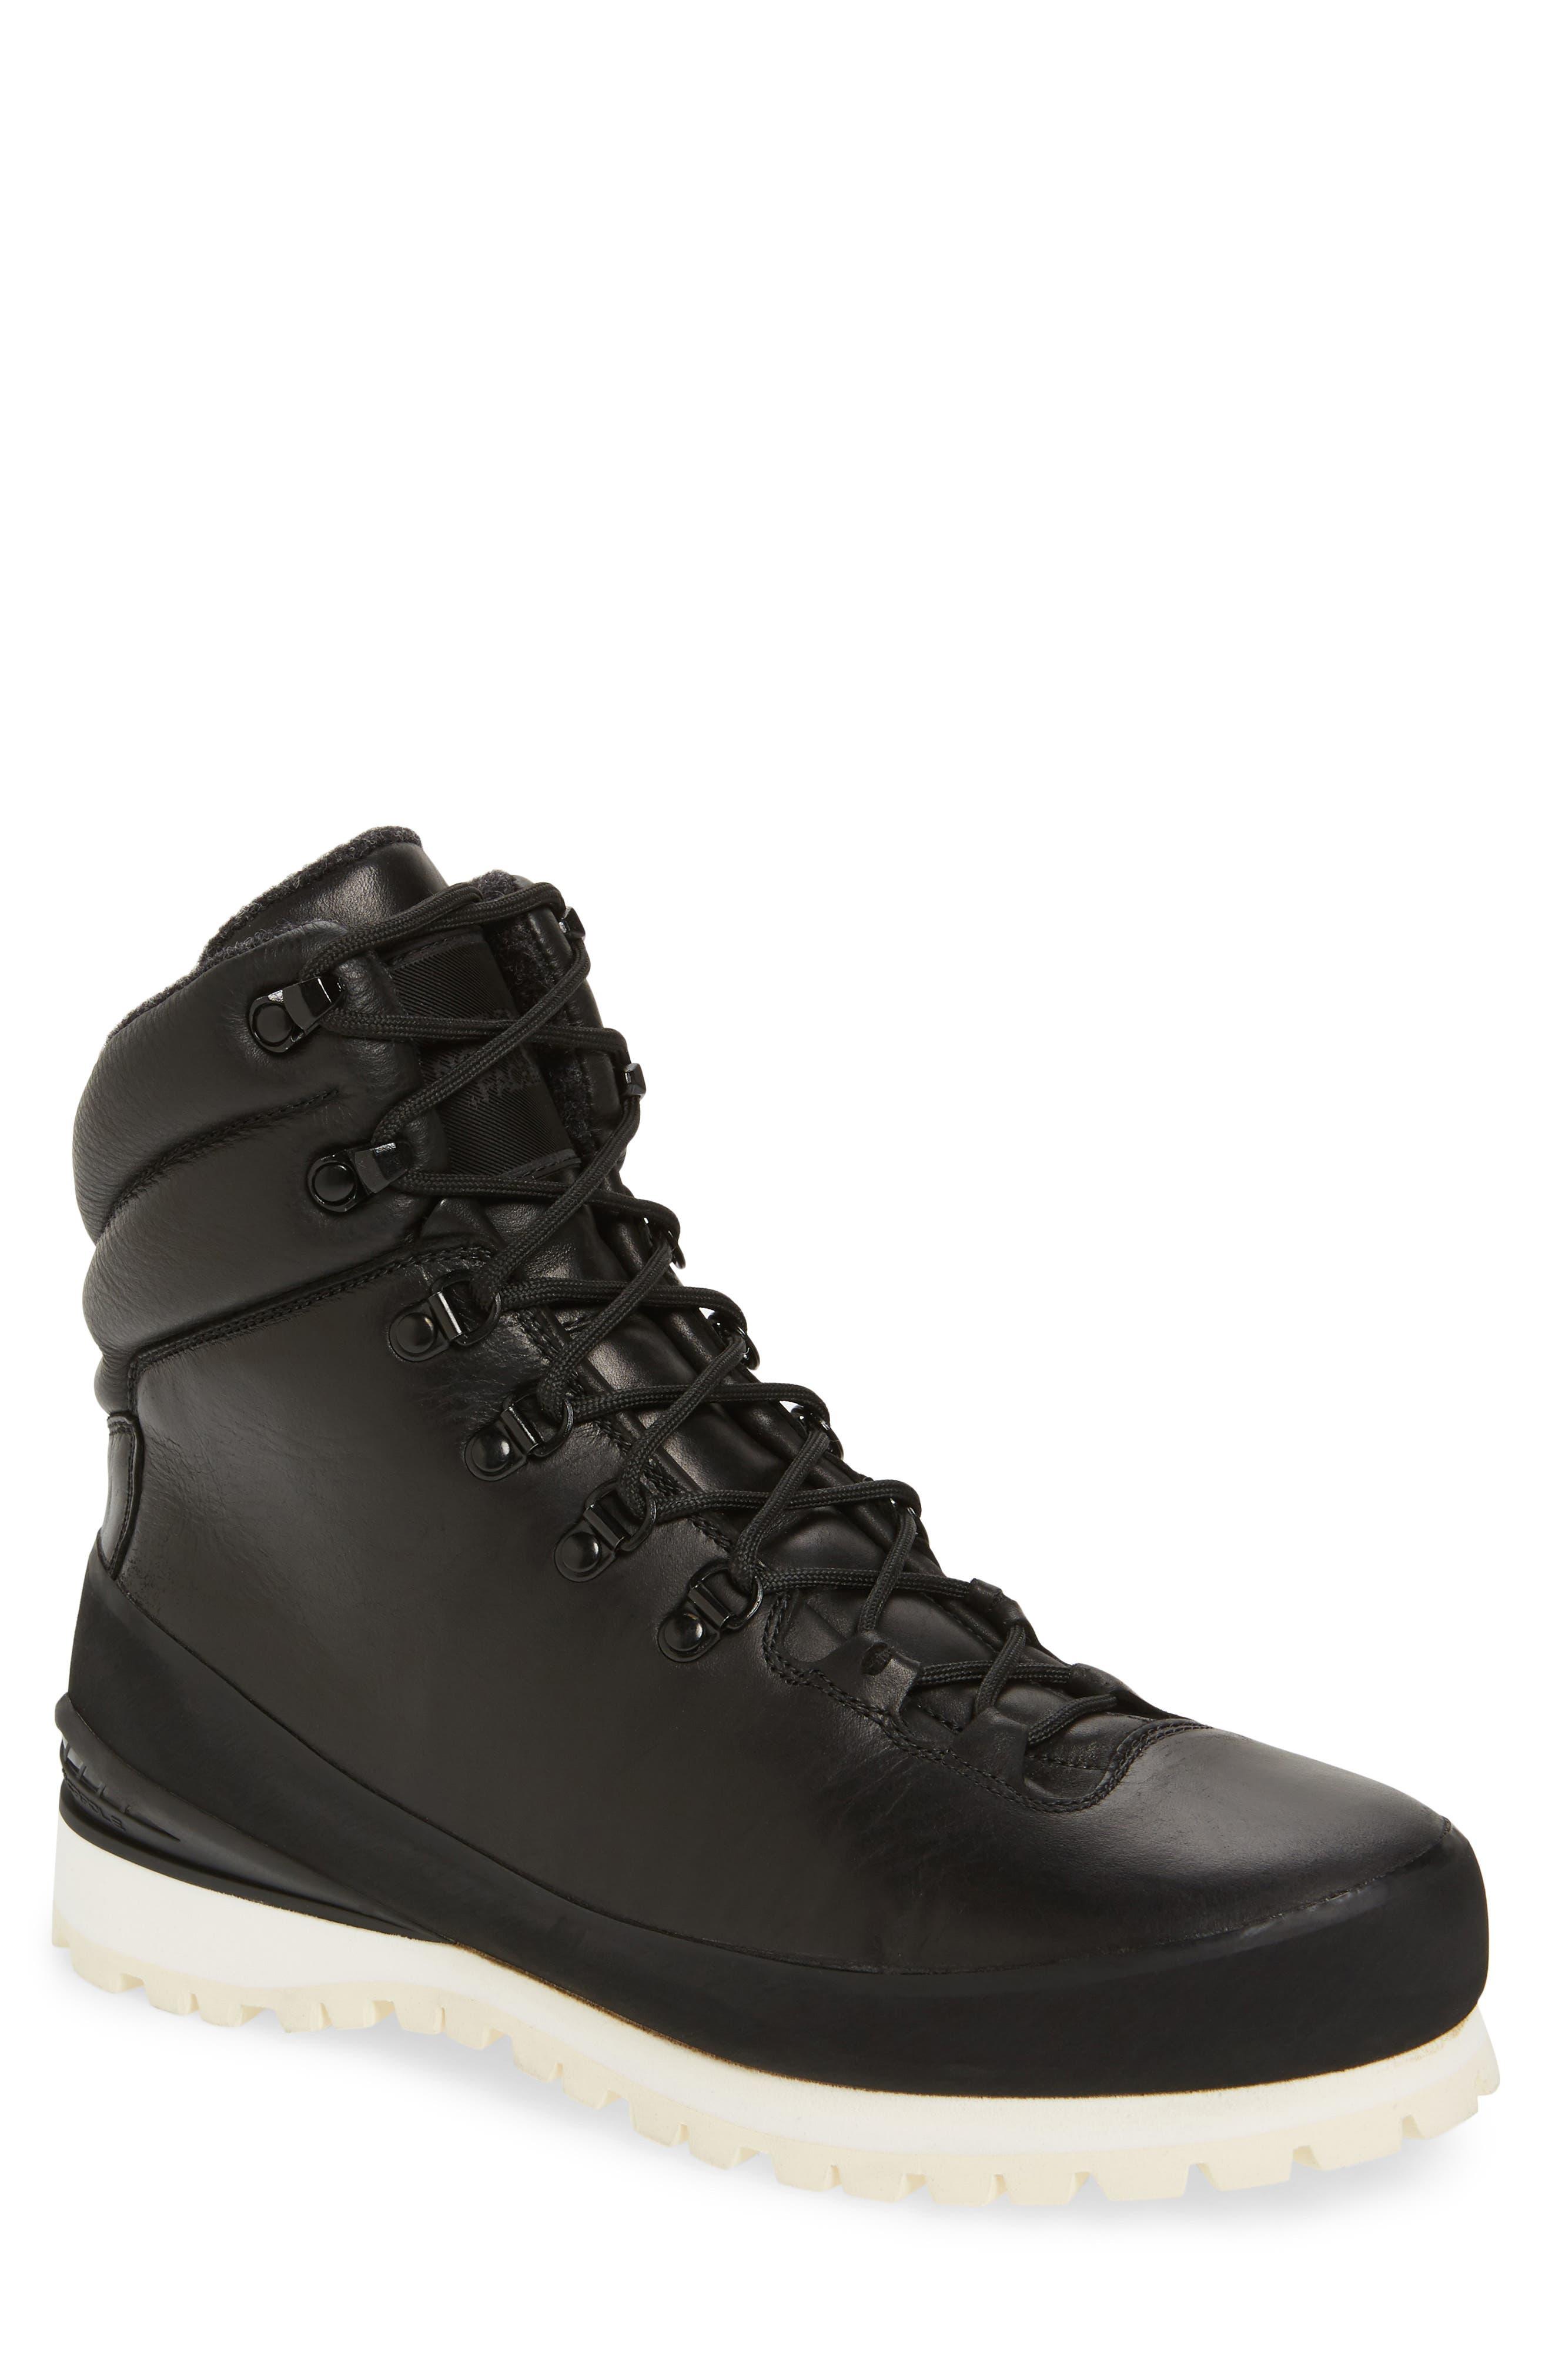 Cryos Hiker Boot,                             Main thumbnail 1, color,                             Tnf Black/ Tnf White